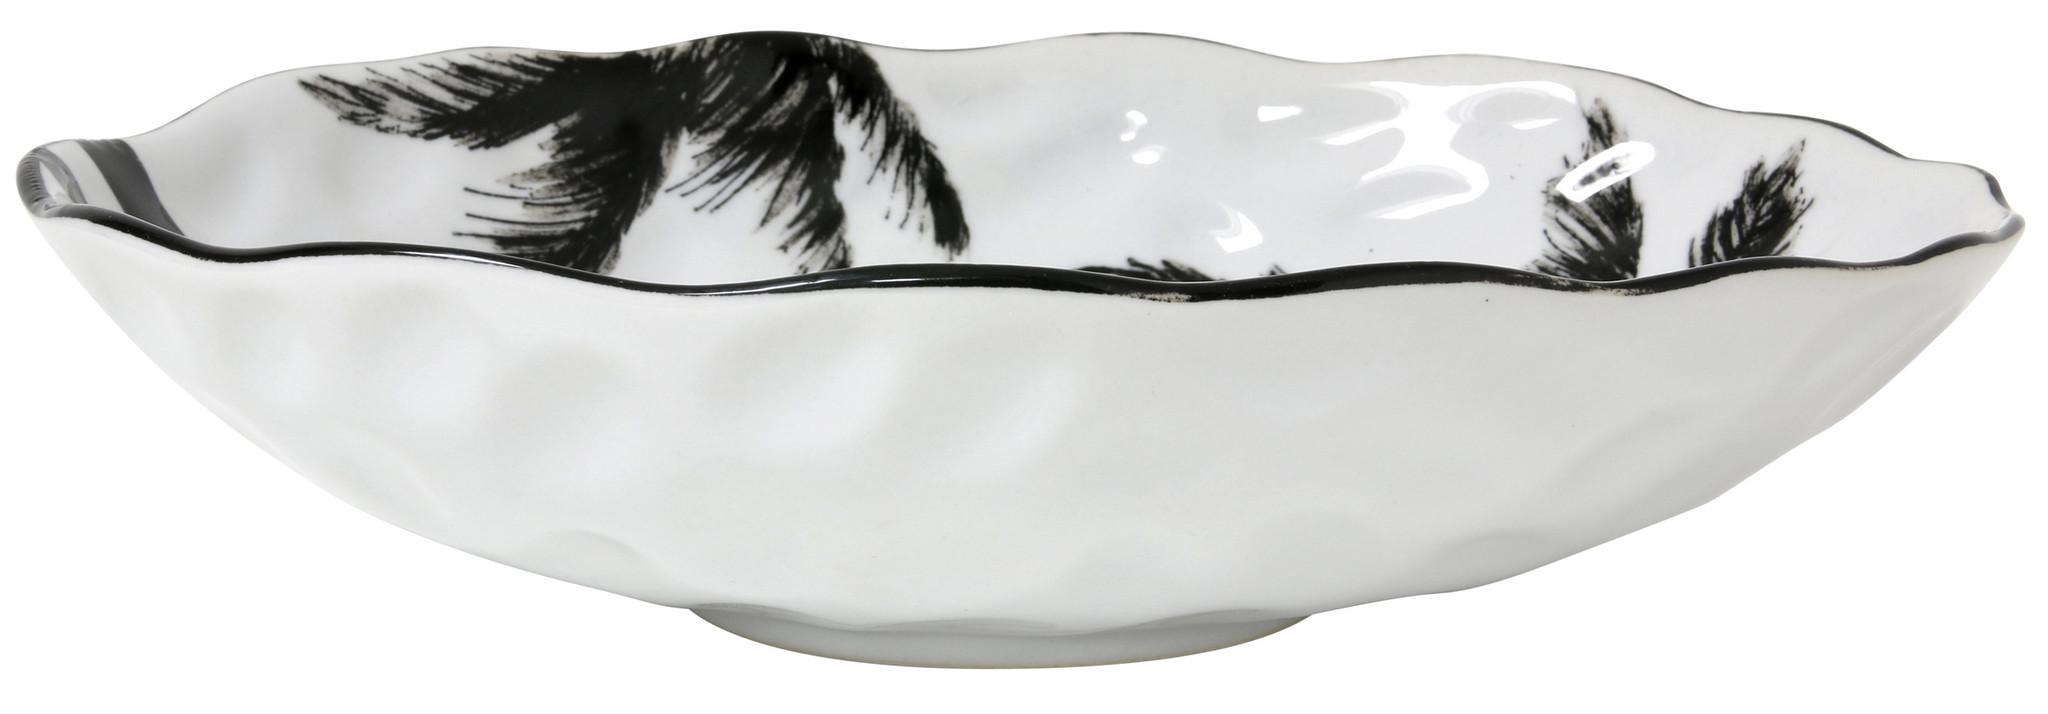 Schaal bold&basic ceramics: porcelain serving bowl palms-3